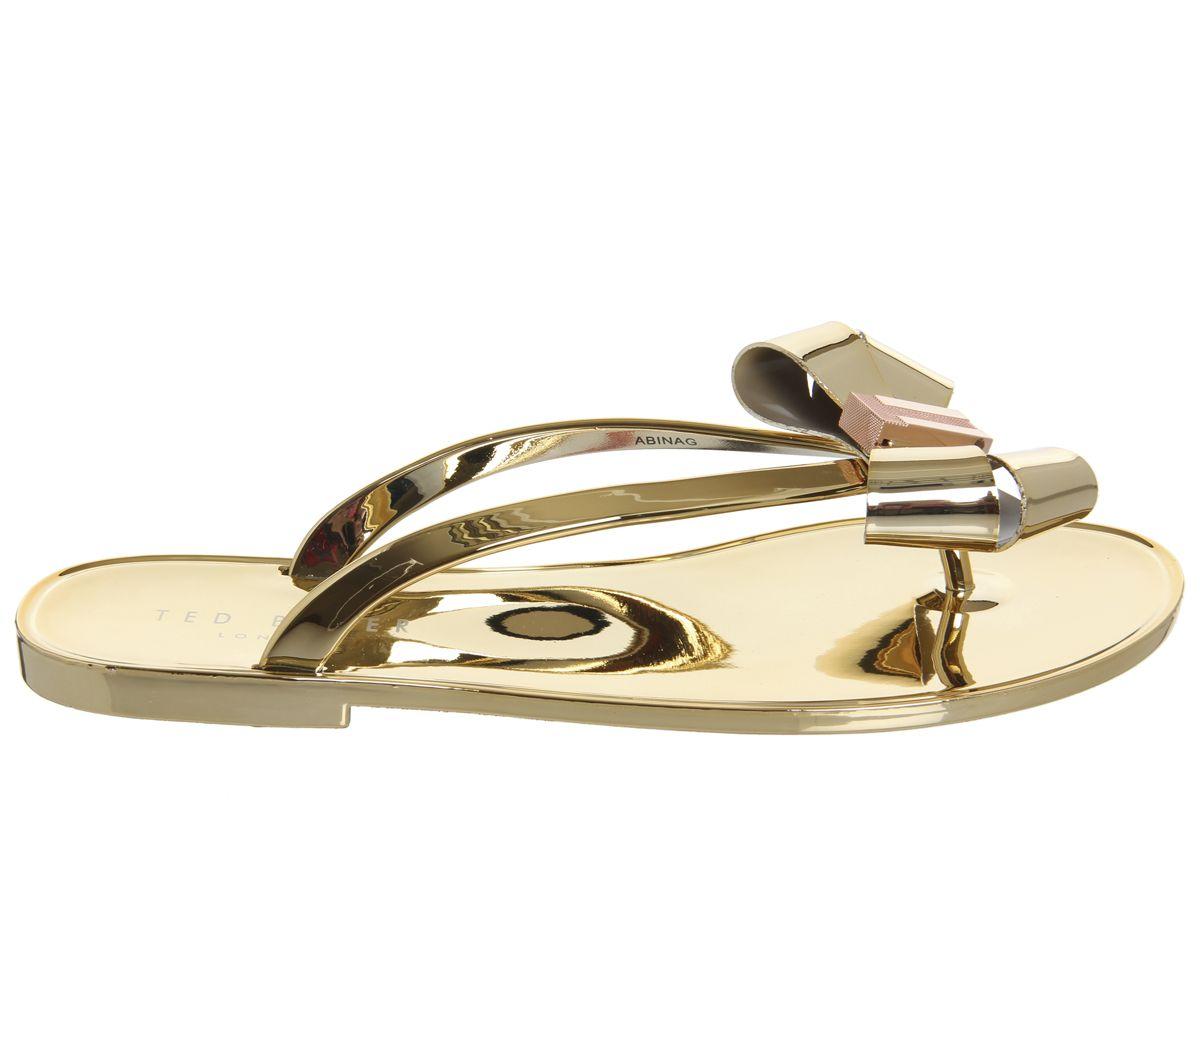 bae66adbc Ted Baker Glamari Flip Flops Gold - Hers Exclusives